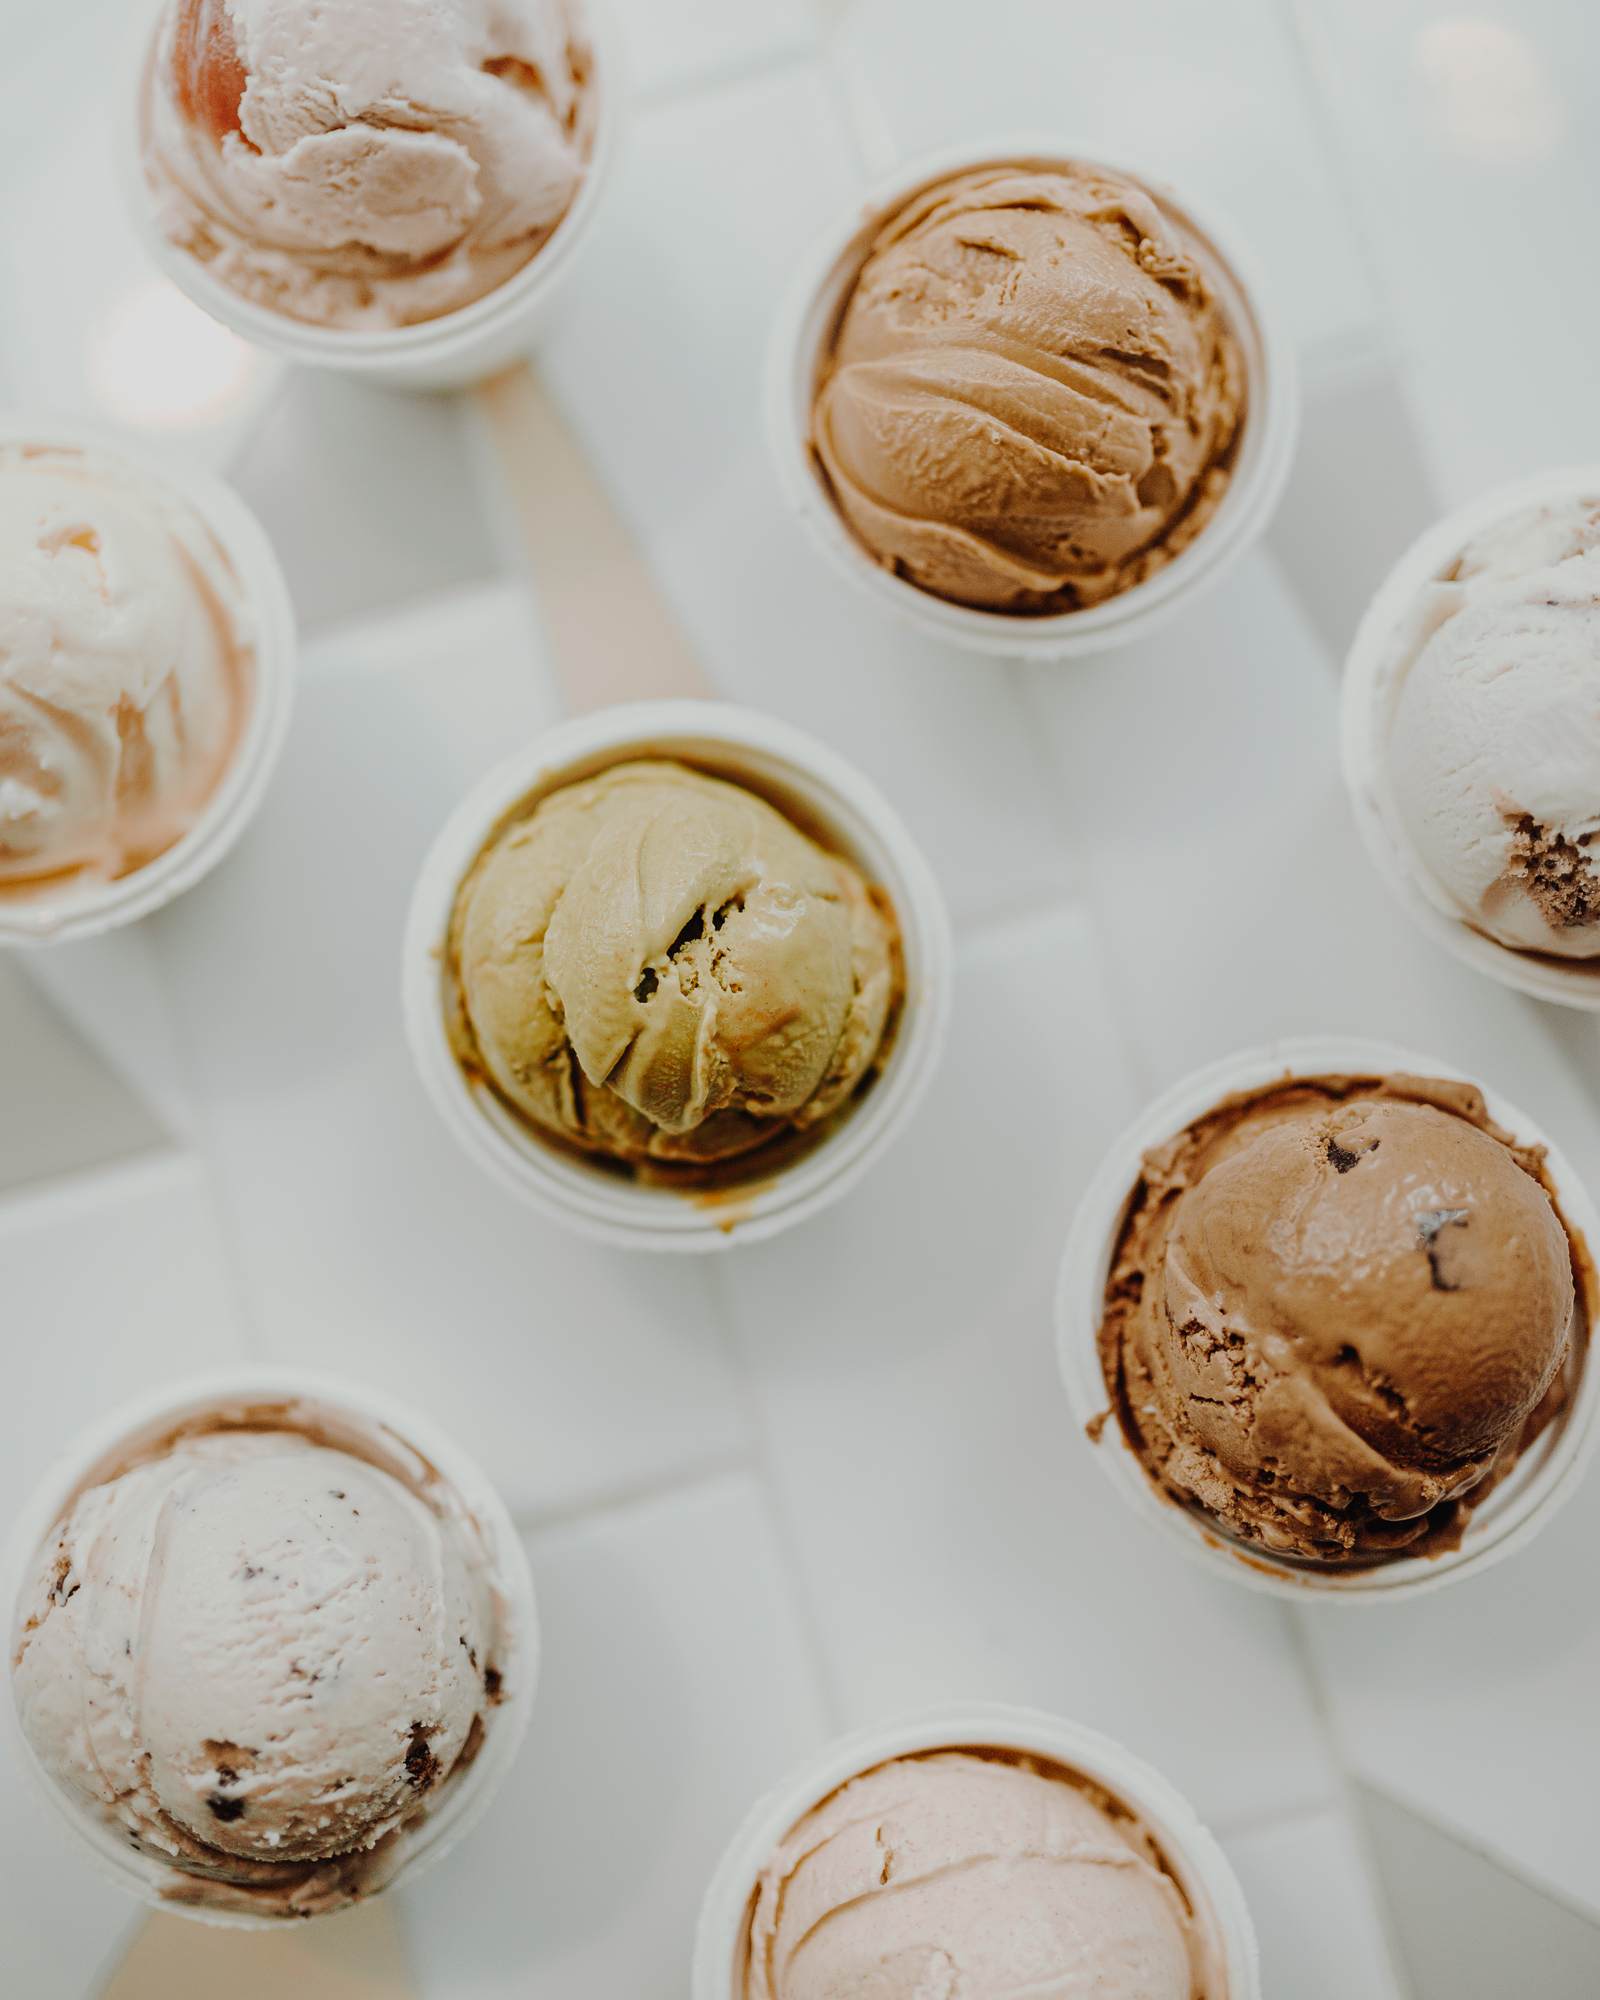 Brooklyn Ice Cream Date Ideas